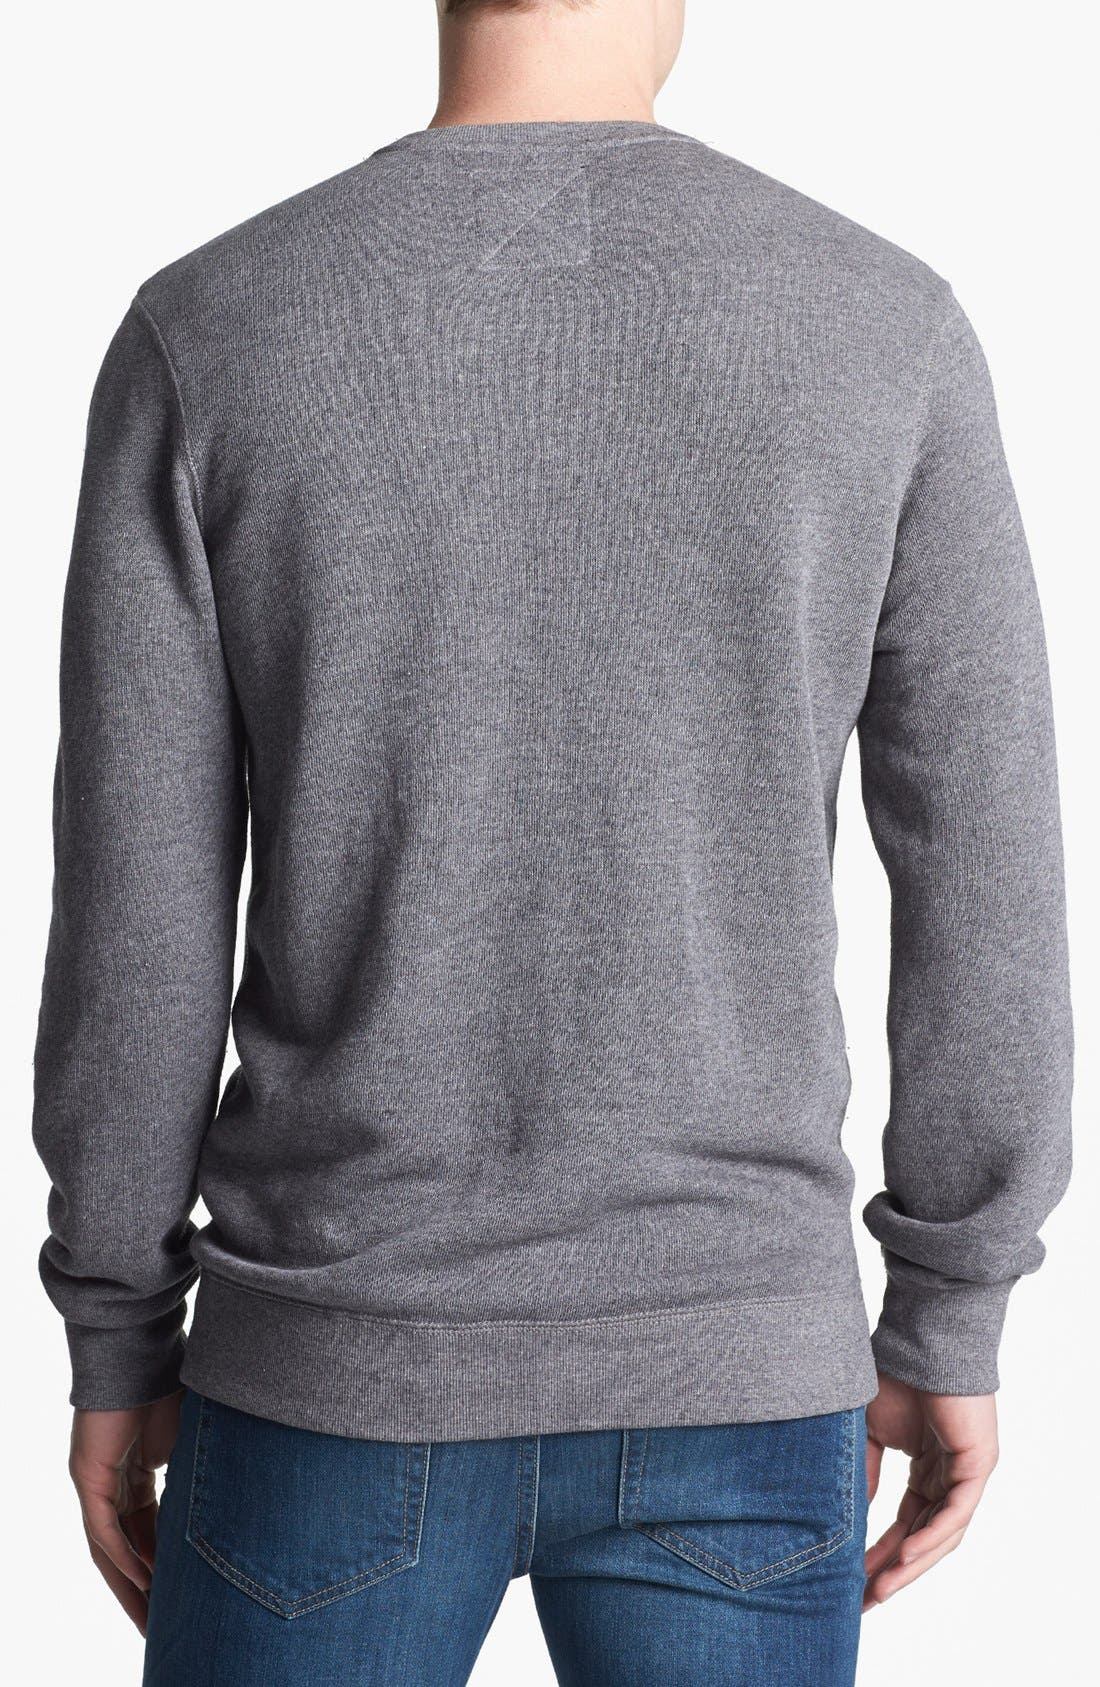 Alternate Image 2  - Vans 'Garnet' Crewneck Sweatshirt